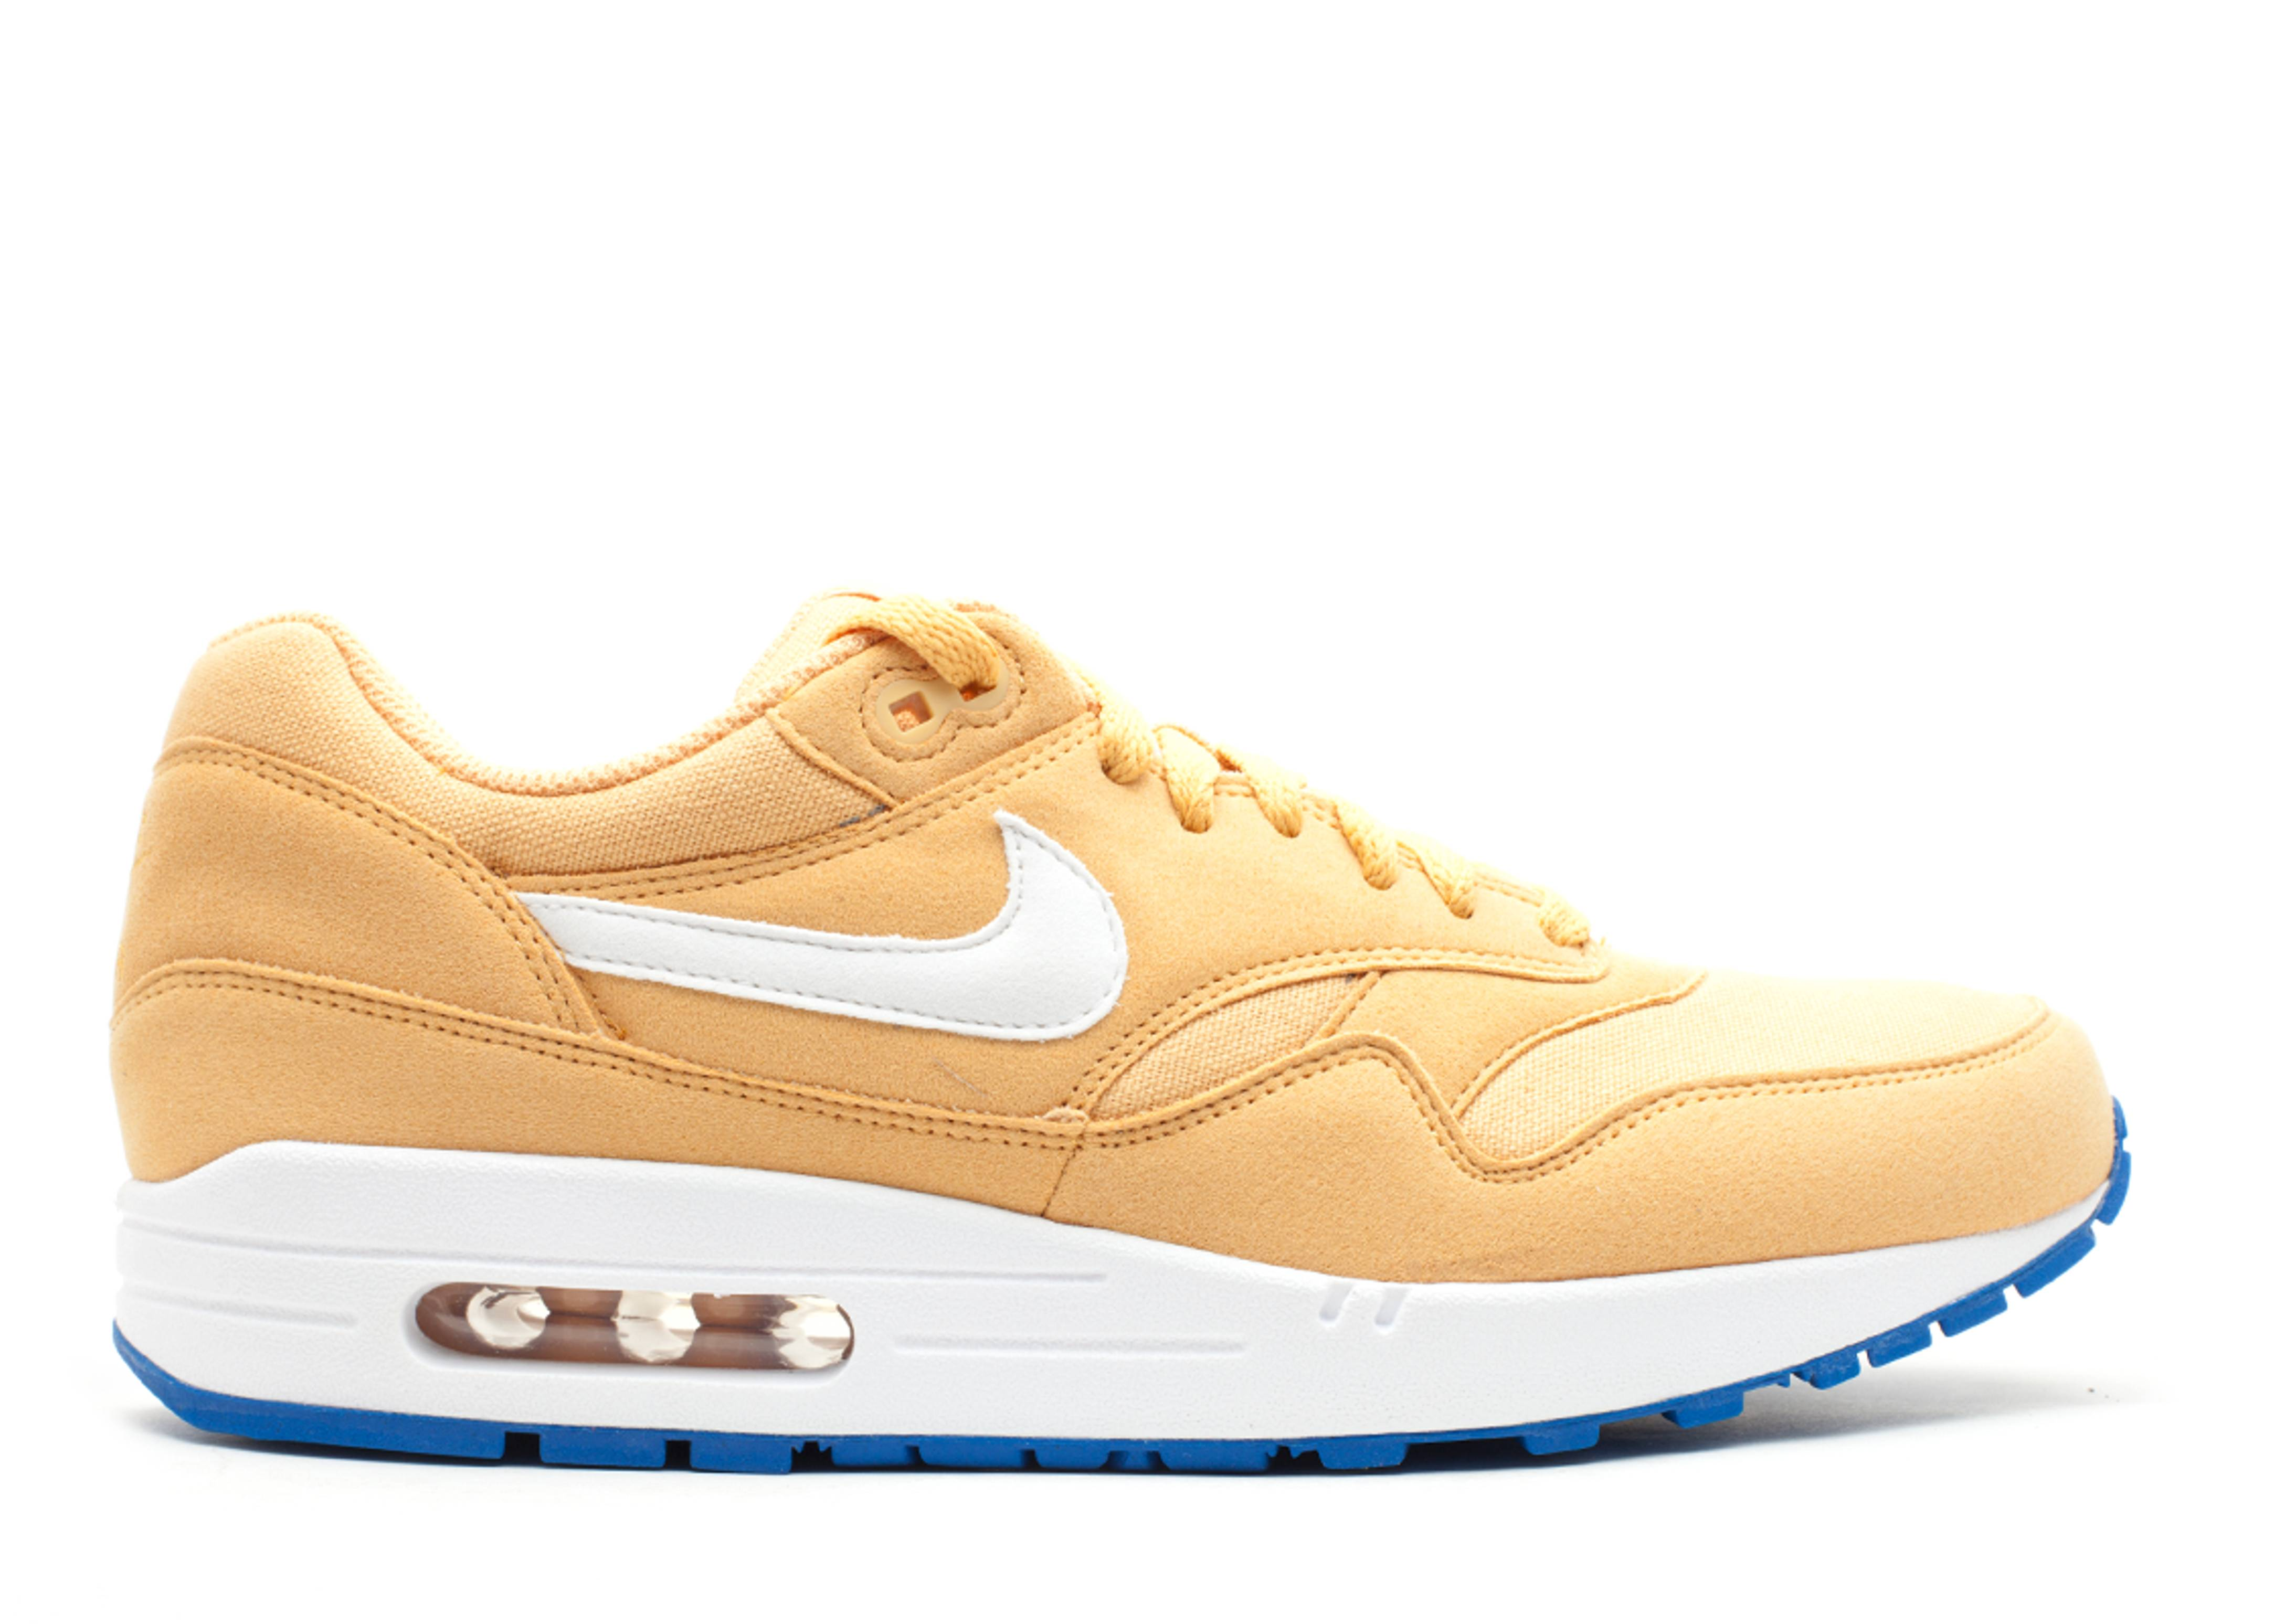 Men's Nike Air Max 1 Honeycomb Blue Spark Sneakers : R89g1370